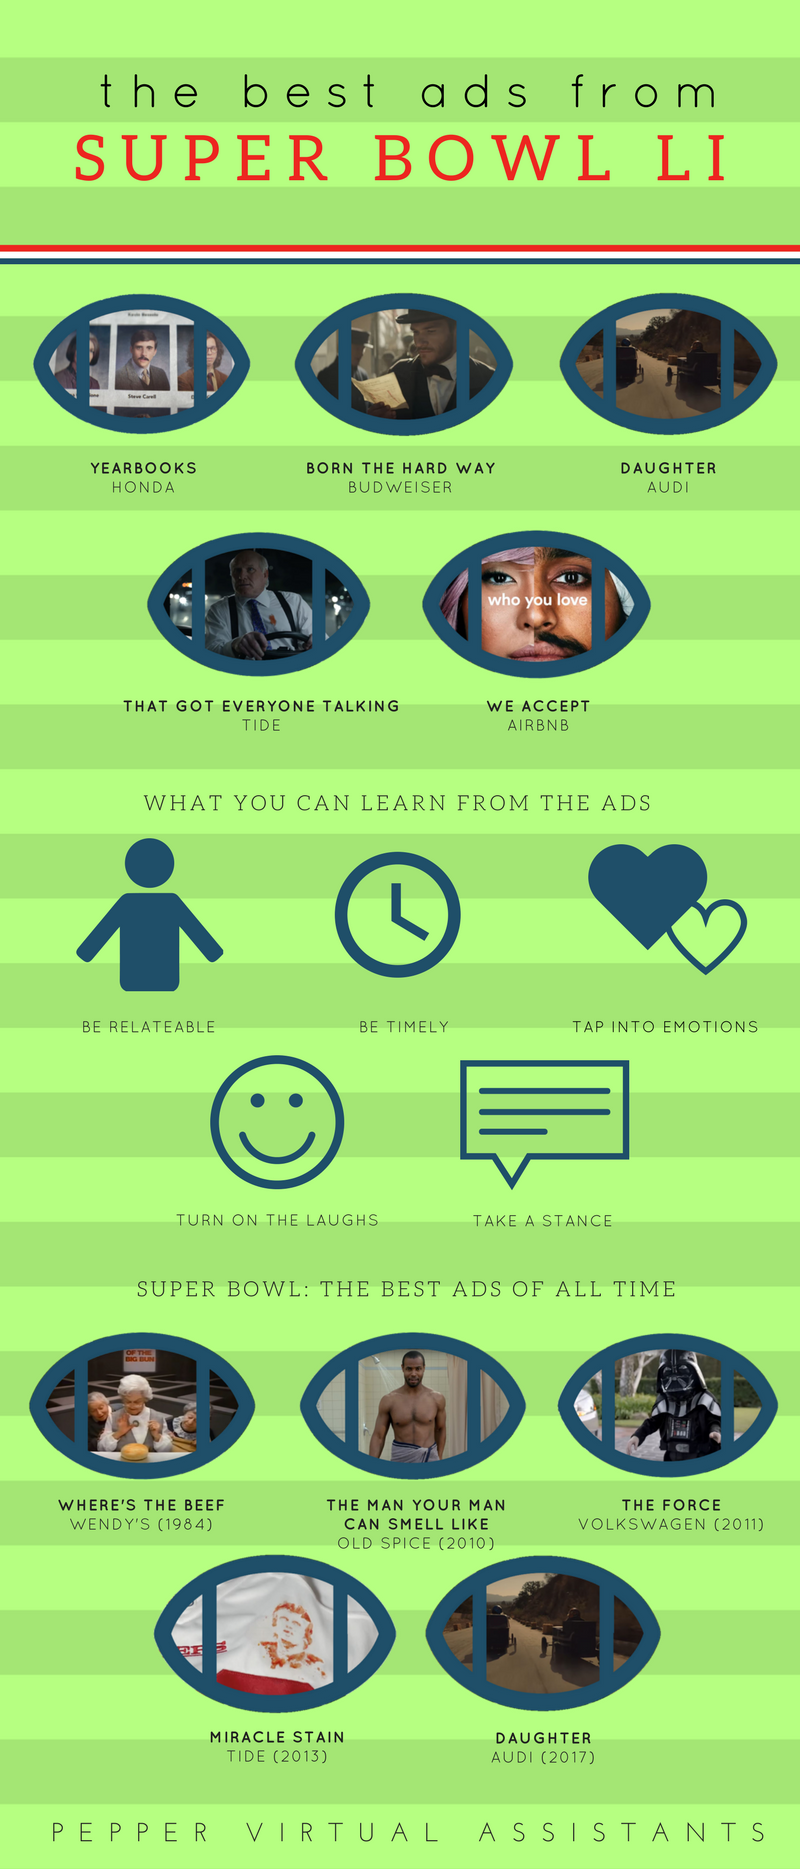 Pepper Virtual Assistants Philippines Super Bowl LI Ads